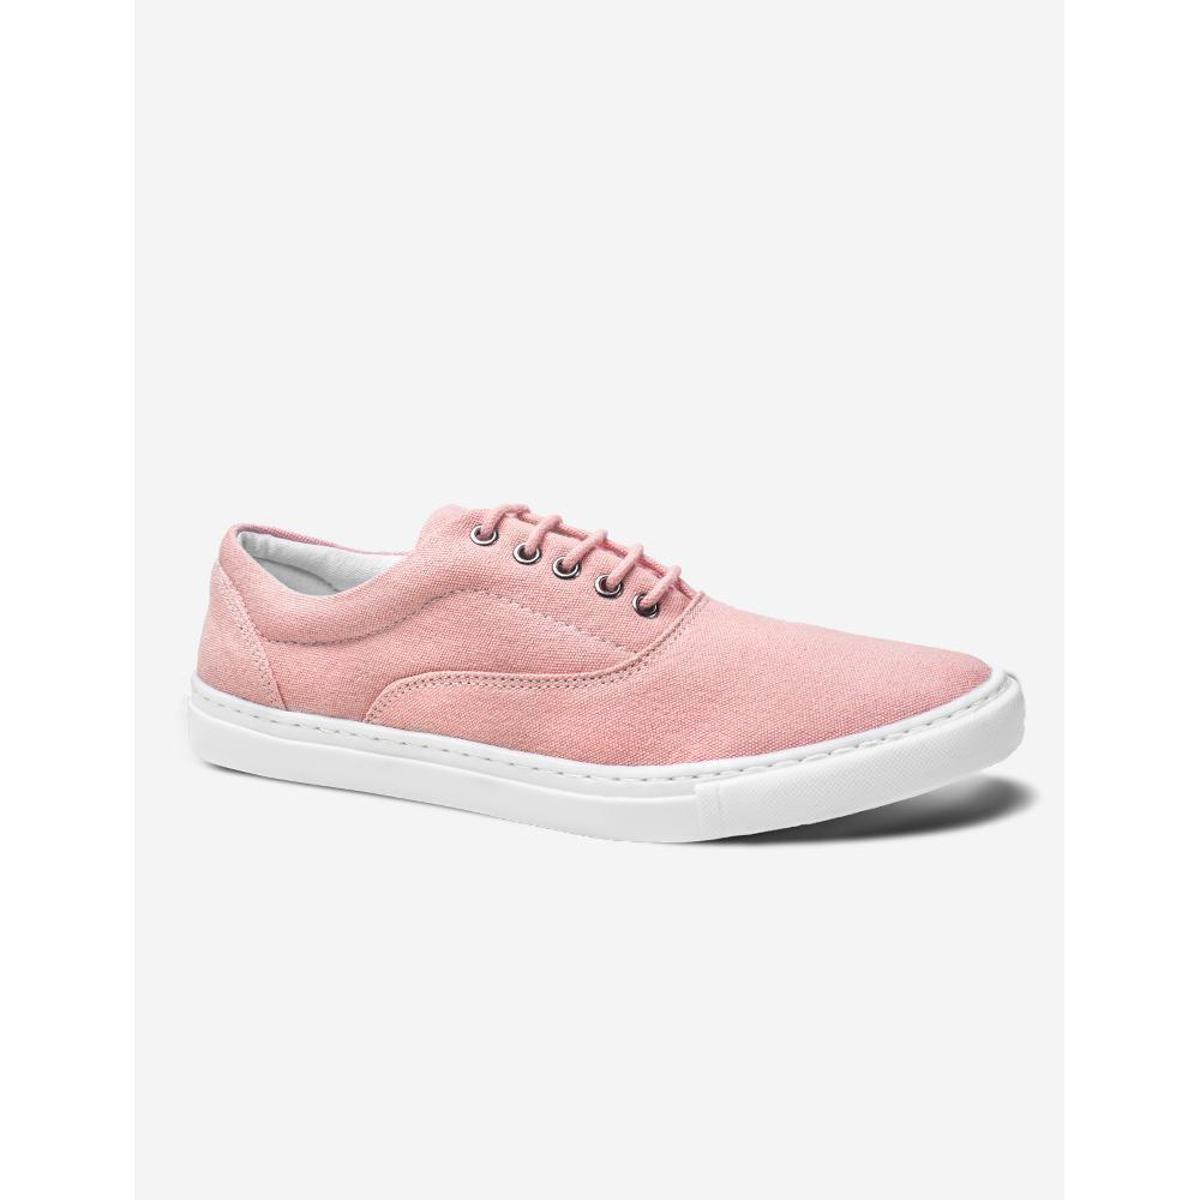 Compadre Tênis Light Rosa Hermoso Pink Compadre Masculino Tênis Hermoso Frzq6F1